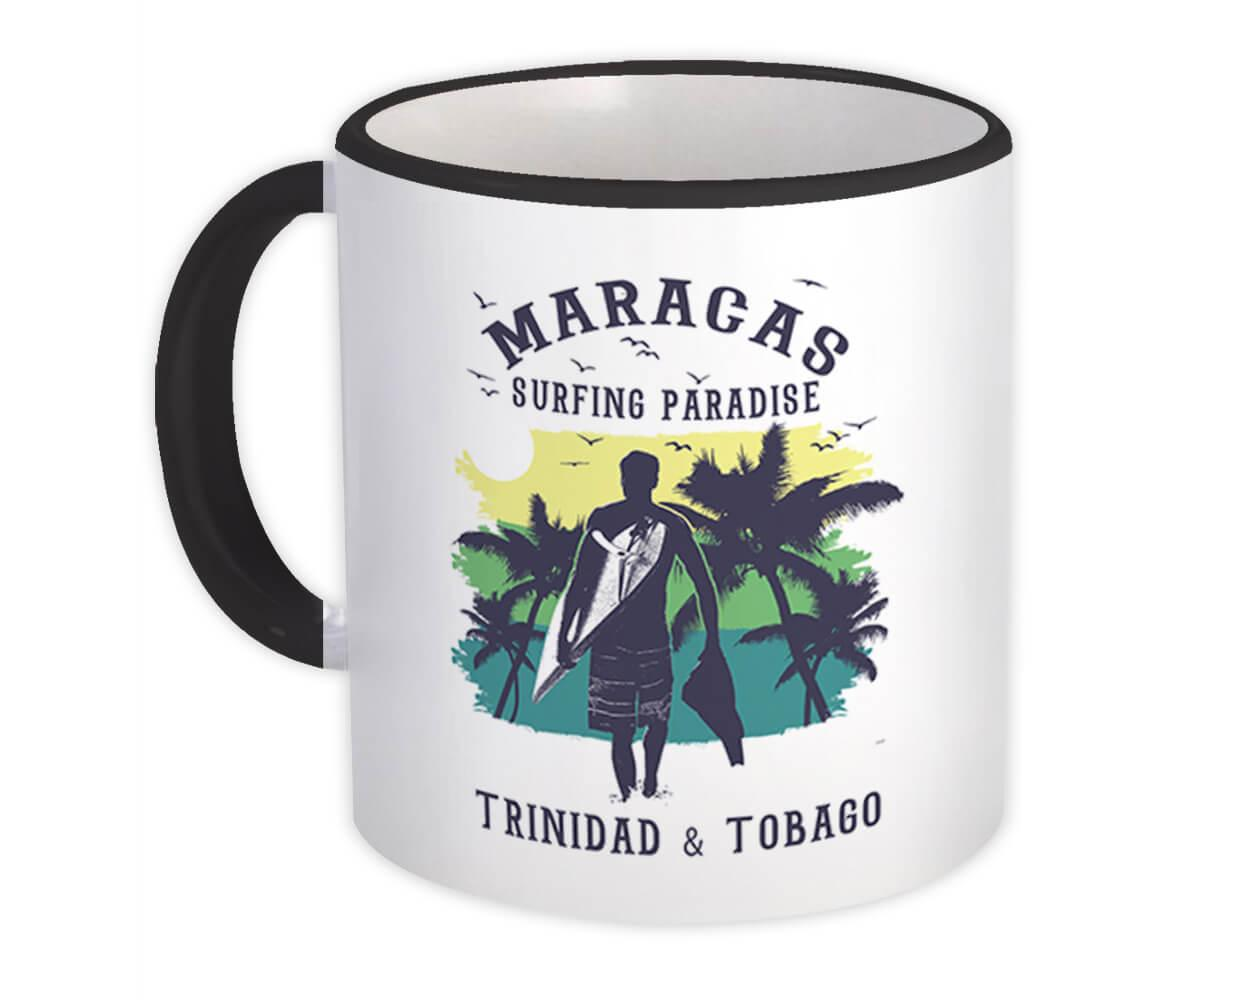 Maracas Trinidad & Tobago : Gift Mug Surfing Paradise Beach Tropical Vacation